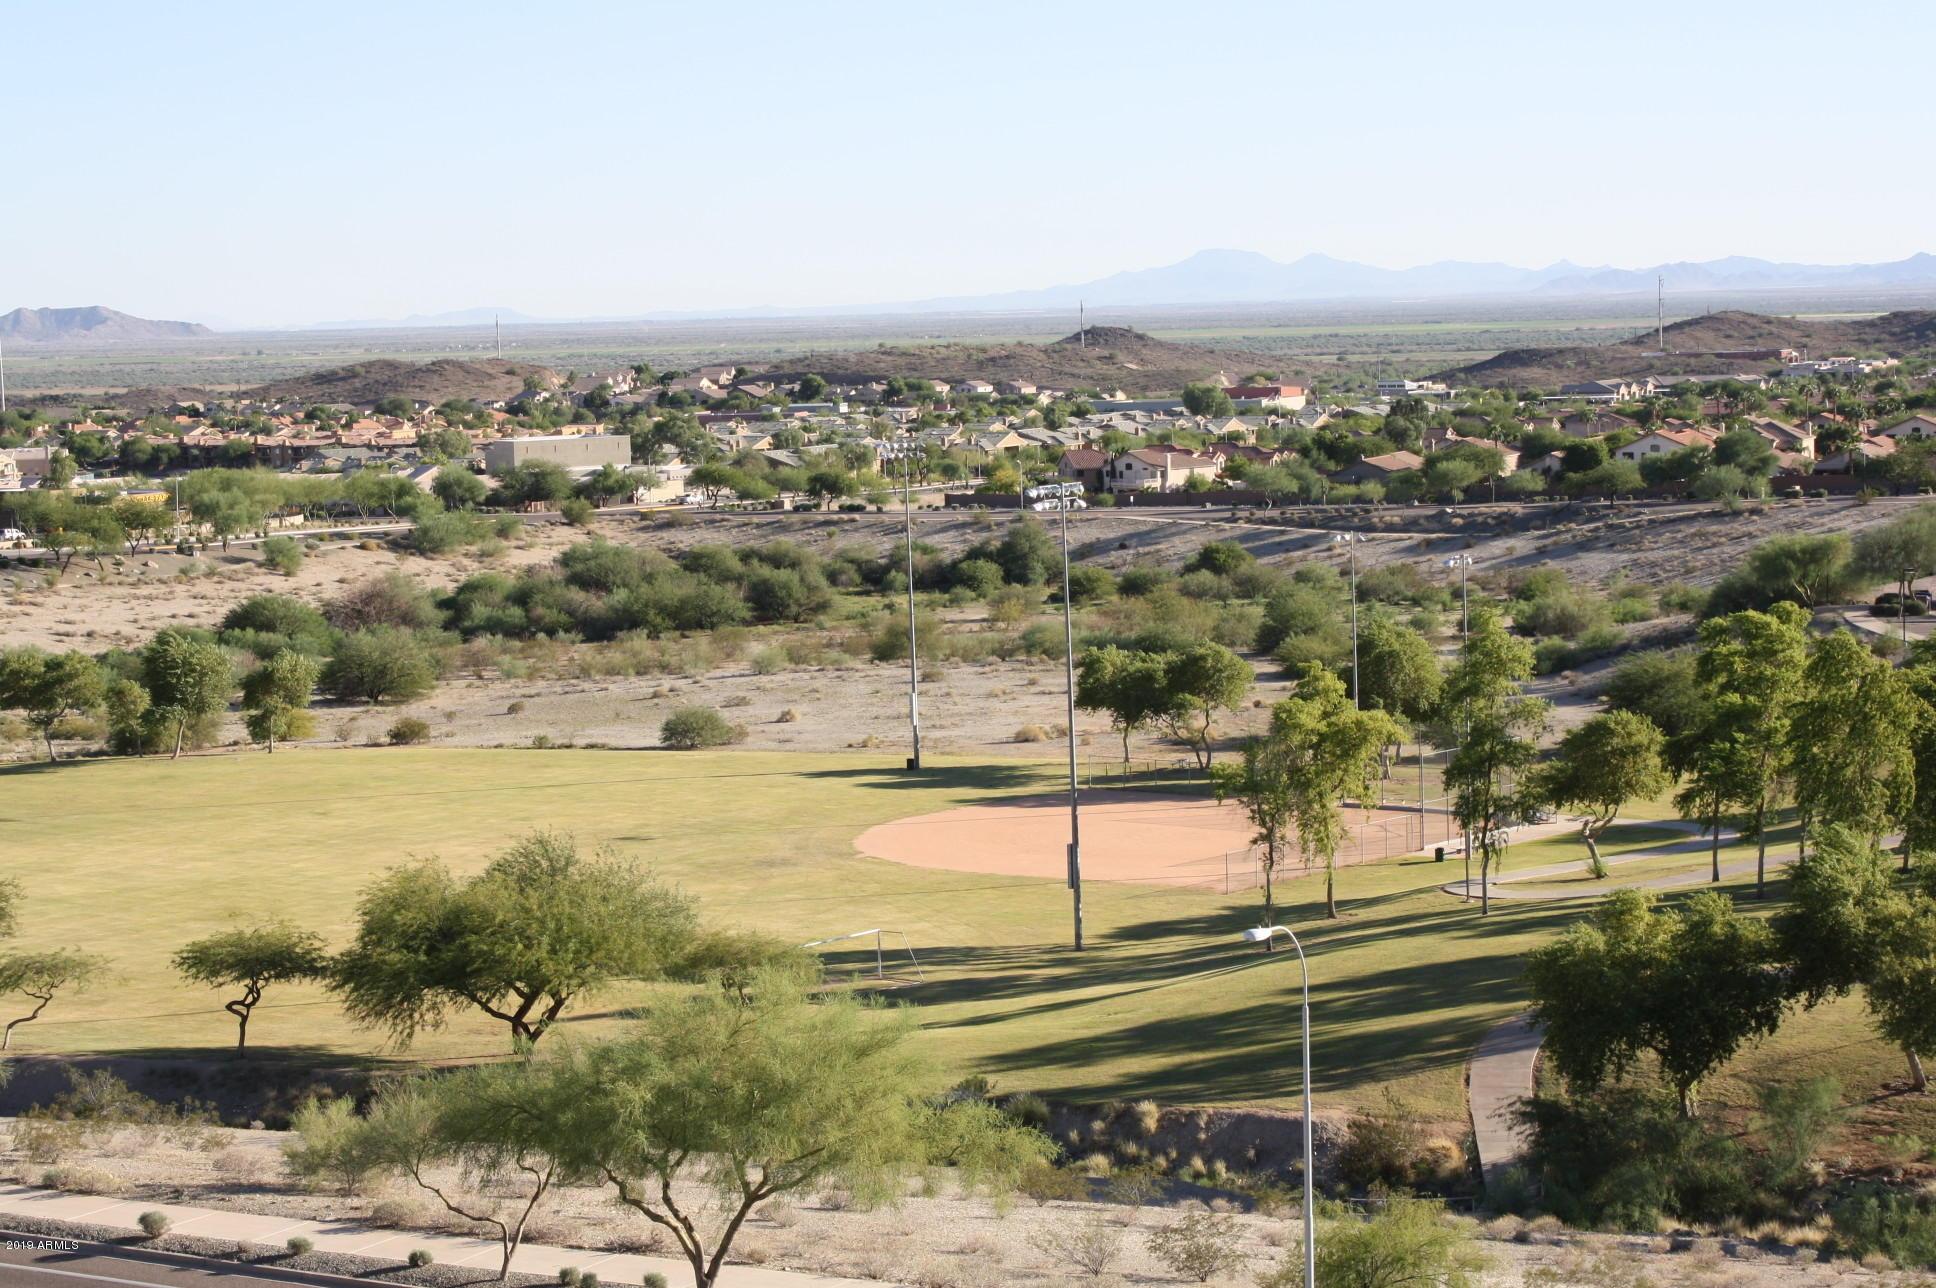 MLS 5869886 1117 E THUNDERHILL Place, Phoenix, AZ 85048 Ahwatukee Community AZ Single-Story